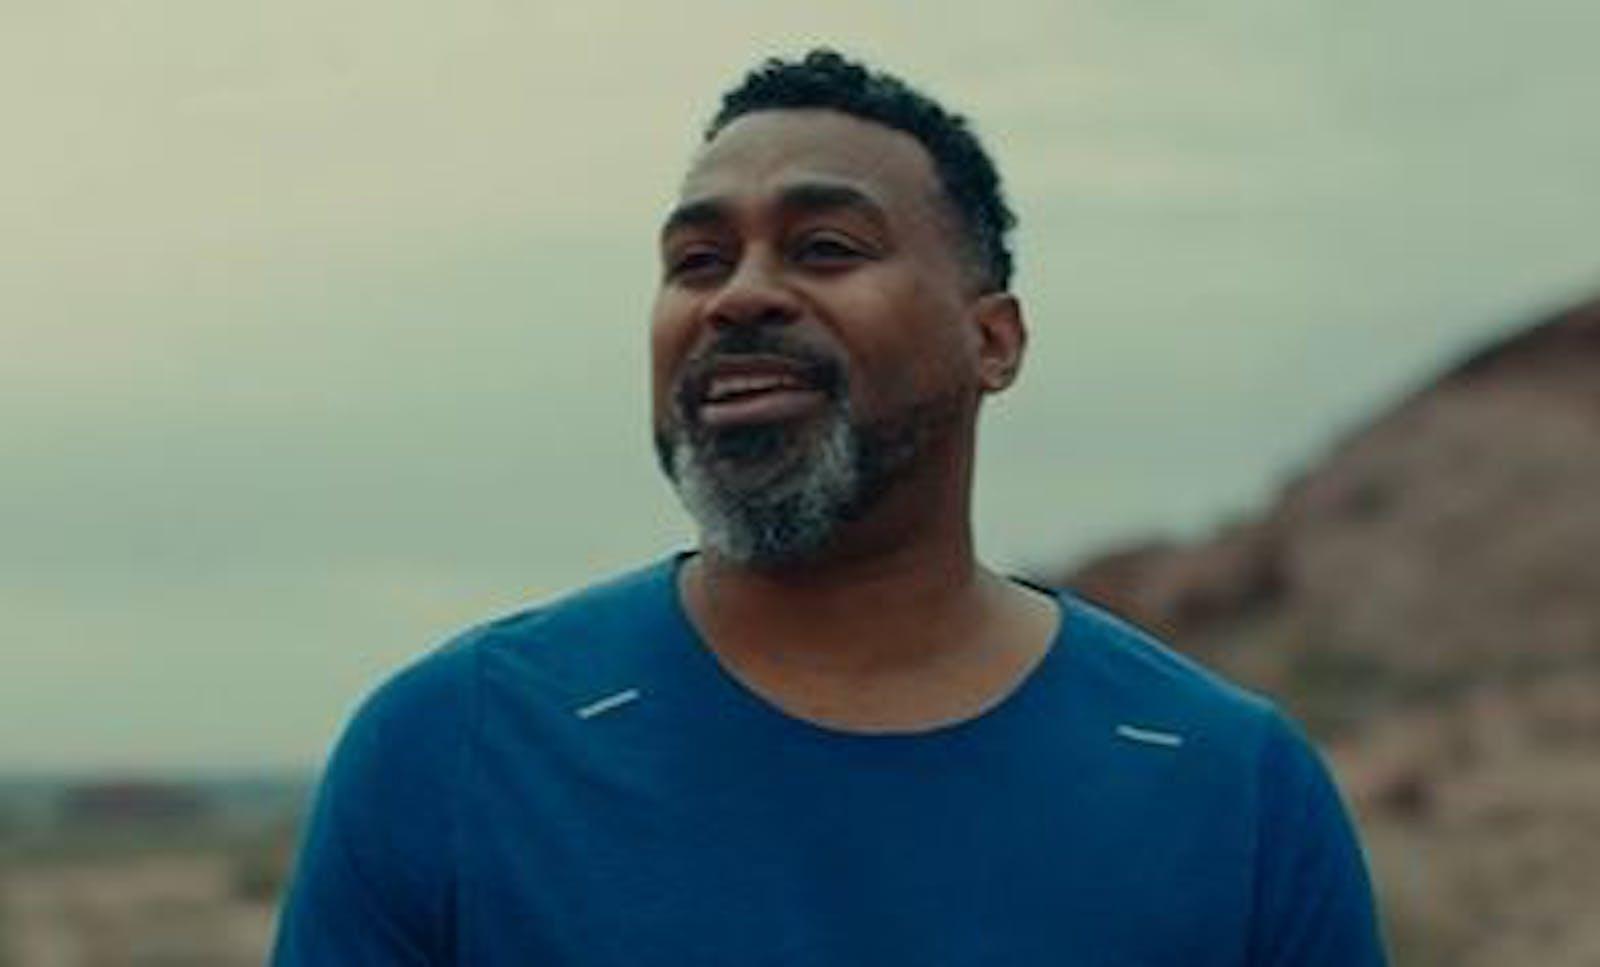 Man in blue t-shirt smiling